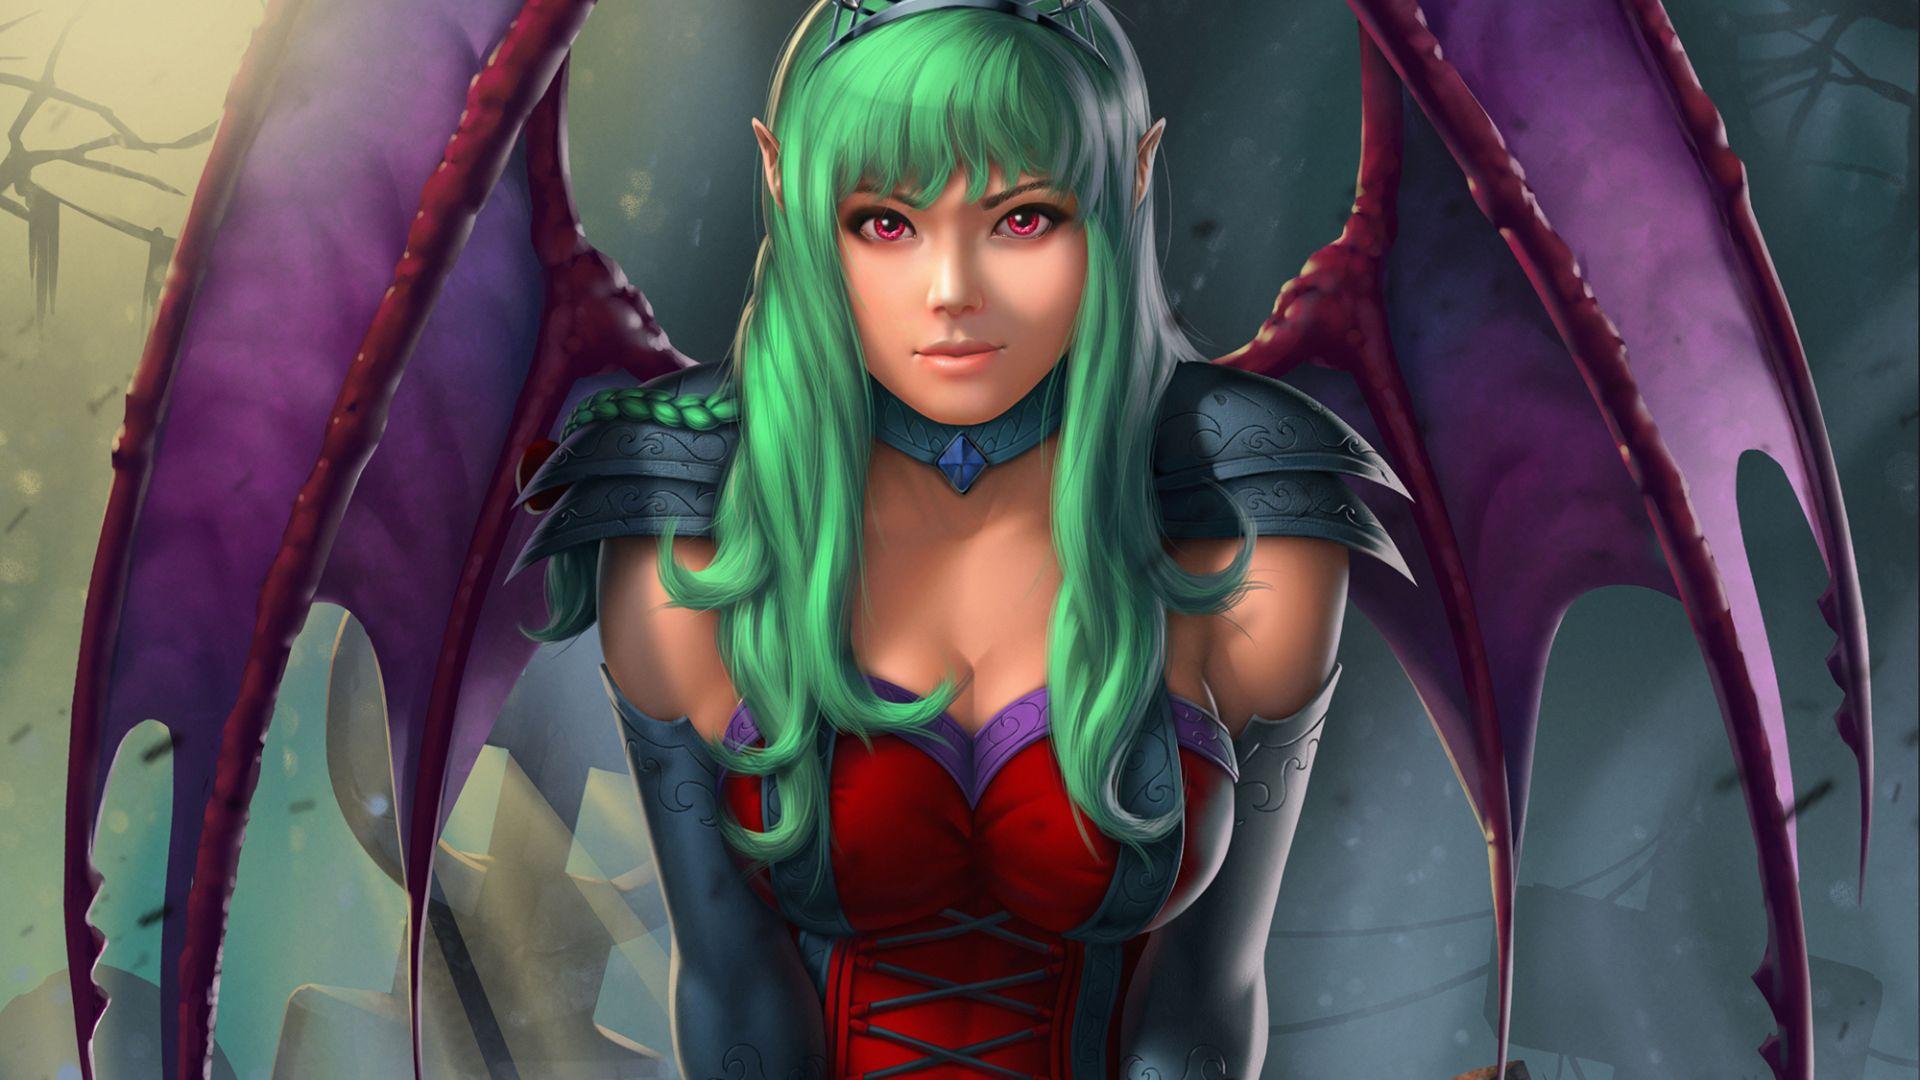 Desktop wallpaper fantasy dragon girl hd image picture background hpnjlf - Hot demon women ...